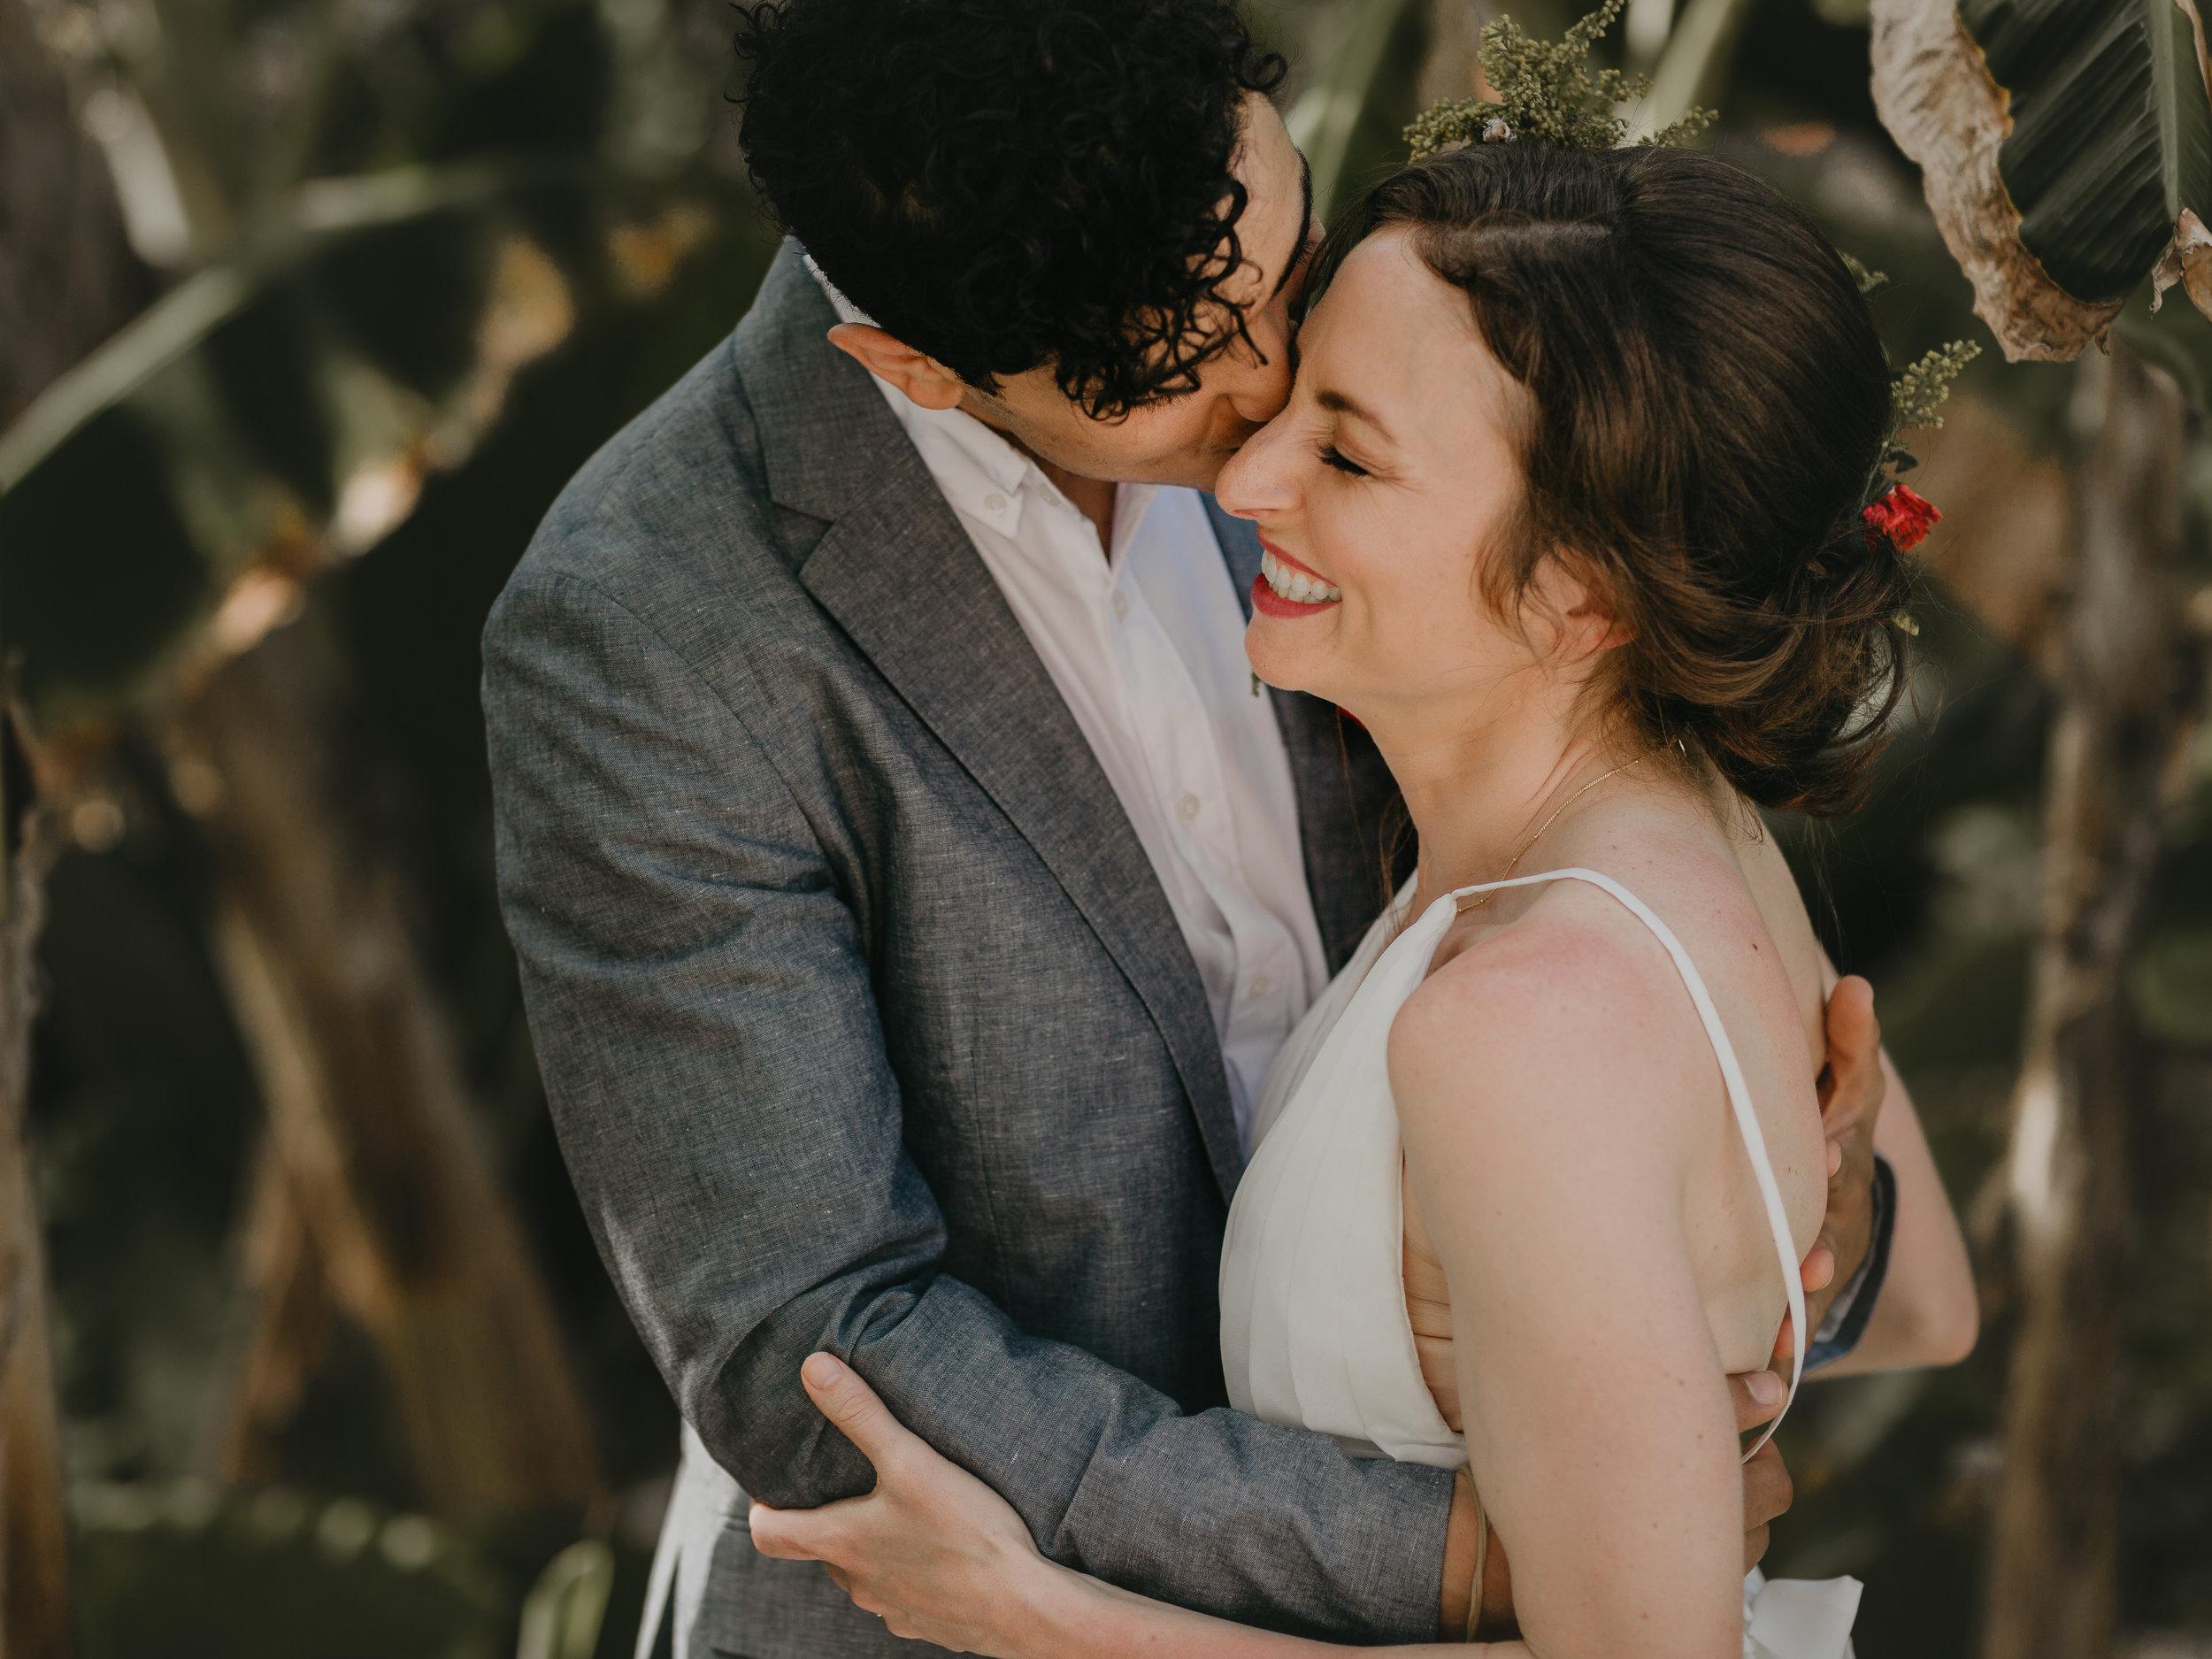 Nicole-Daacke-Photography-beachfront-akumal-destionation-wedding-tulum-mexico-elopement-photographer-destination-wedding-inspiration-sunset-champagne-pop-boho-bride-ocean-tropical-bohemian-tulum-wedding-photos-114.jpg